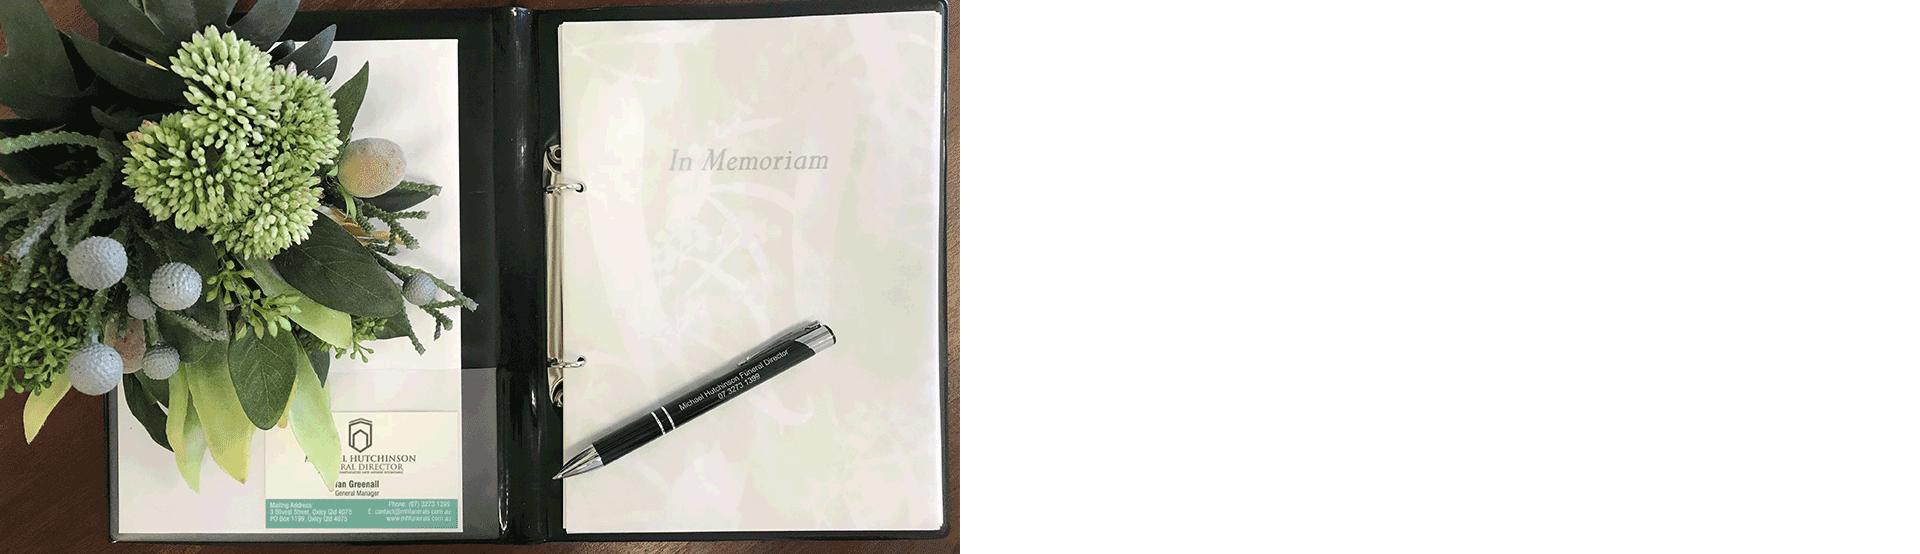 Home MH Funerals Memorial Booklet